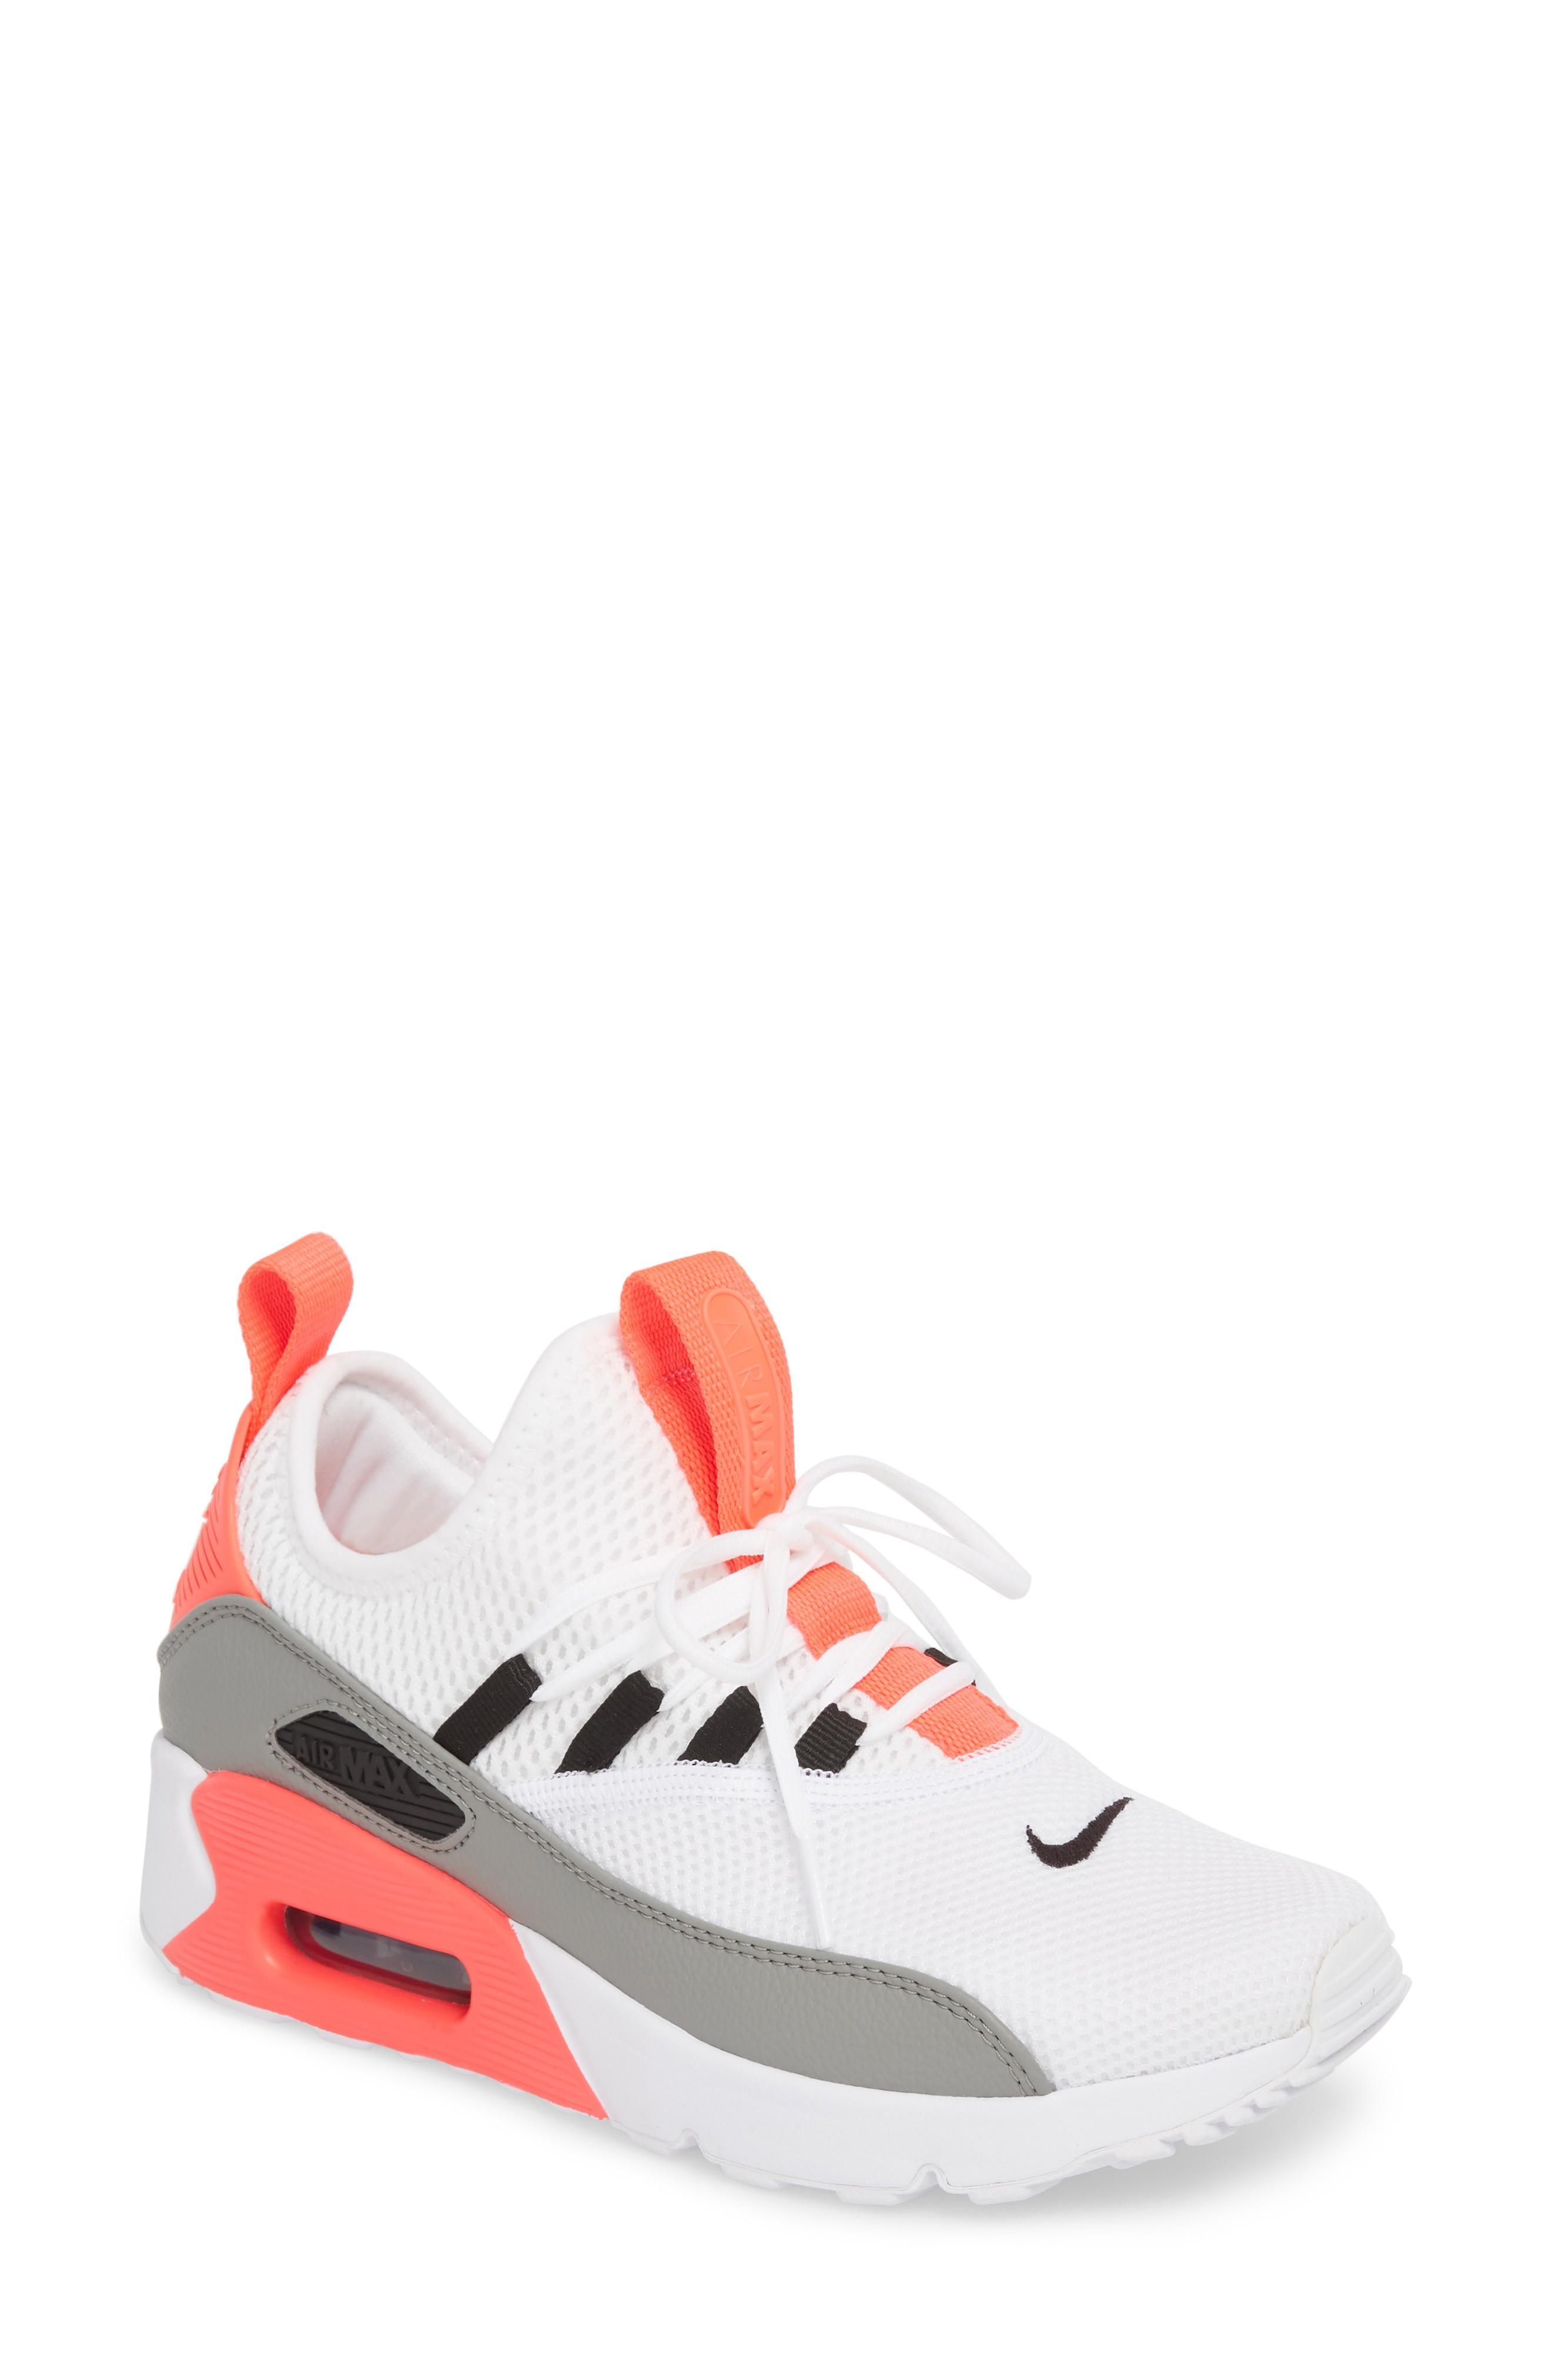 945ff68a0b Nike Women's Air Max 90 Ultra 2.0 Ease Casual Shoes, White   ModeSens